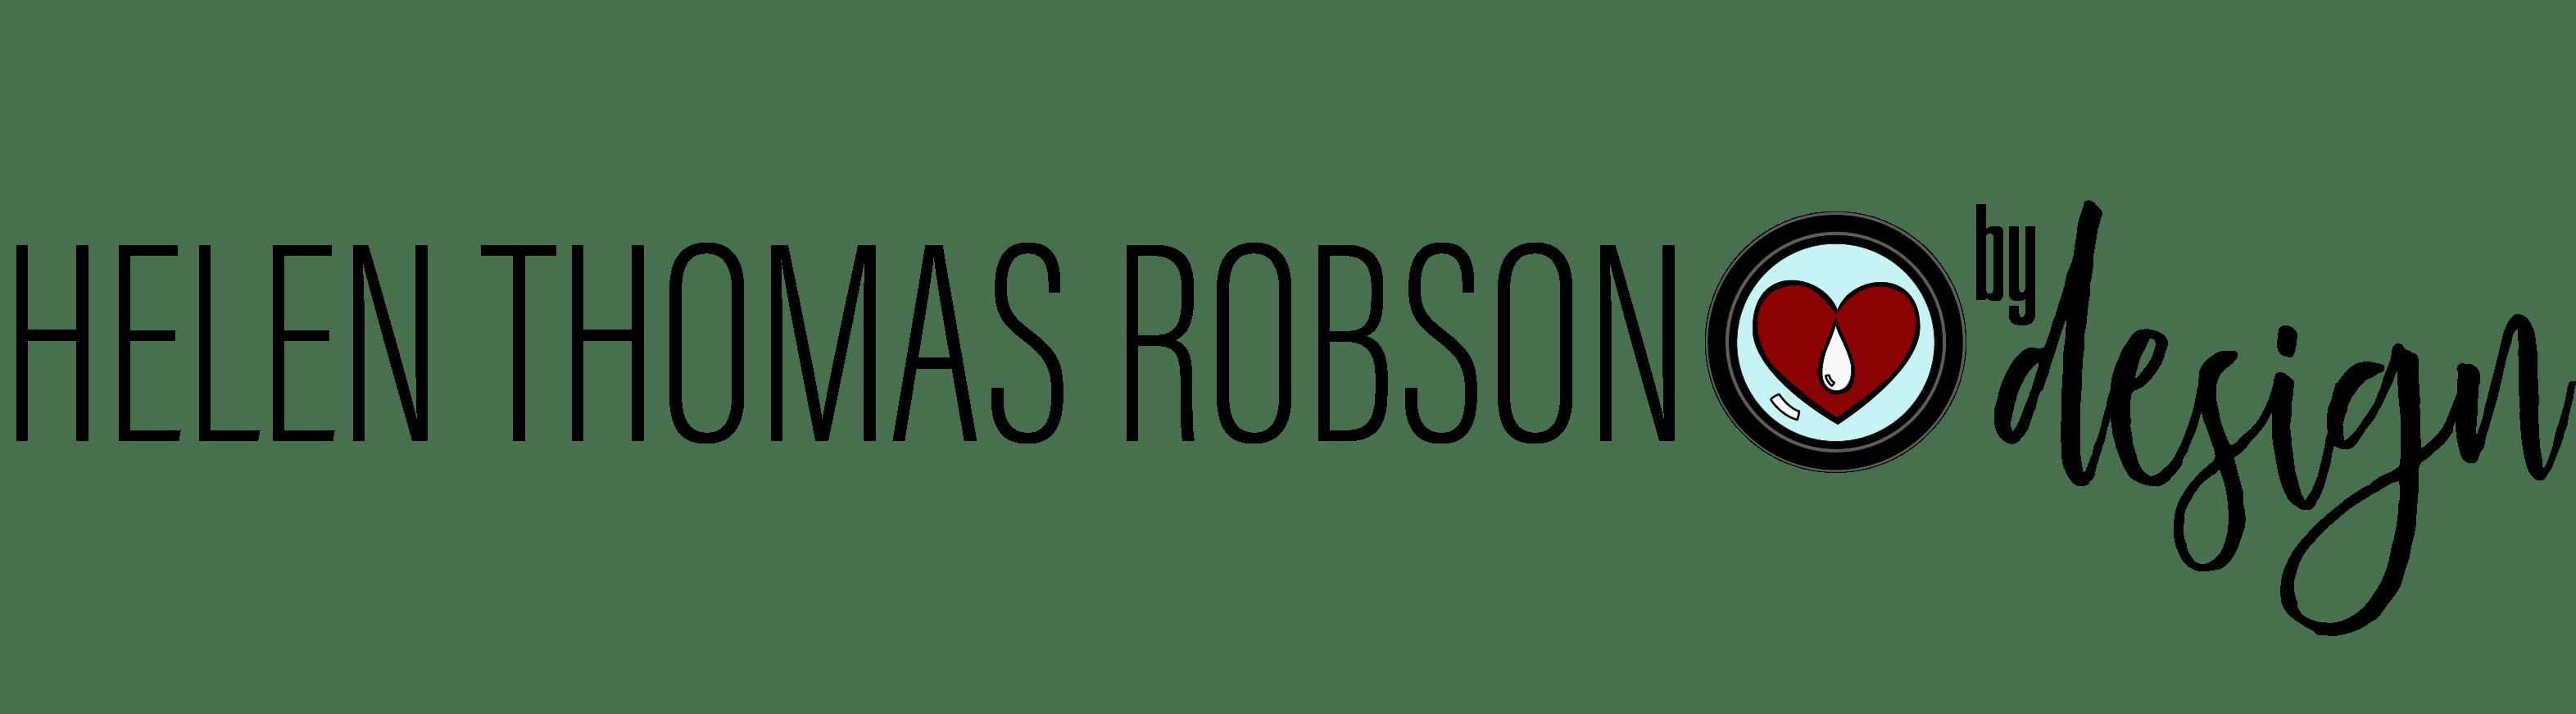 helenthomasrobson